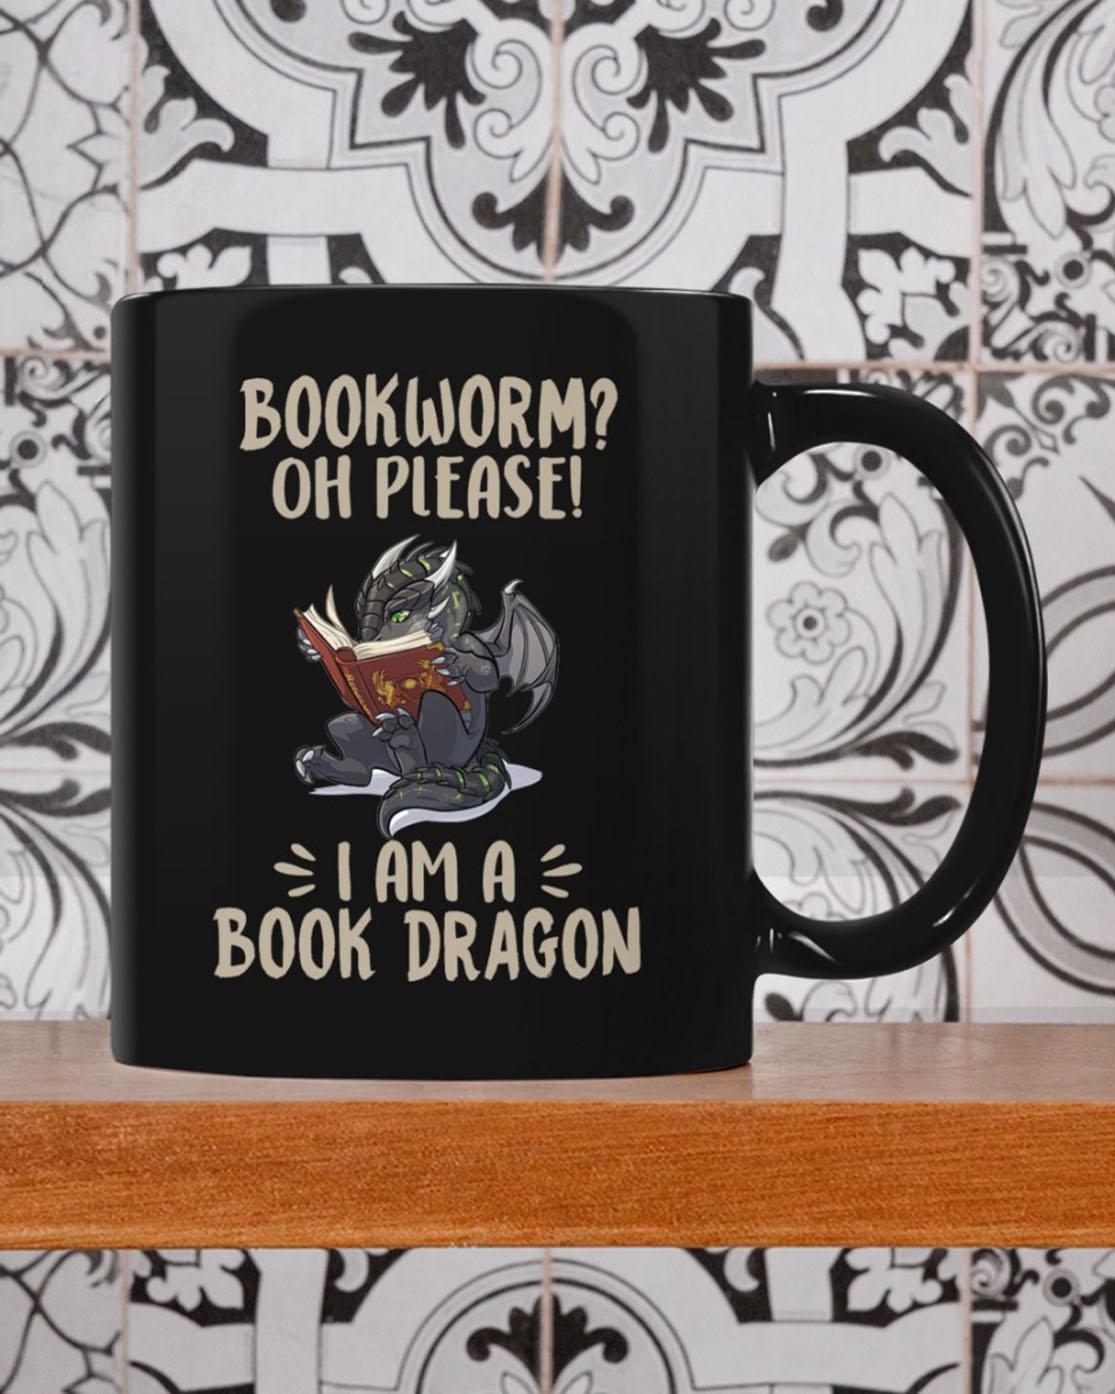 Bookworm Oh please I am a book dragon mug